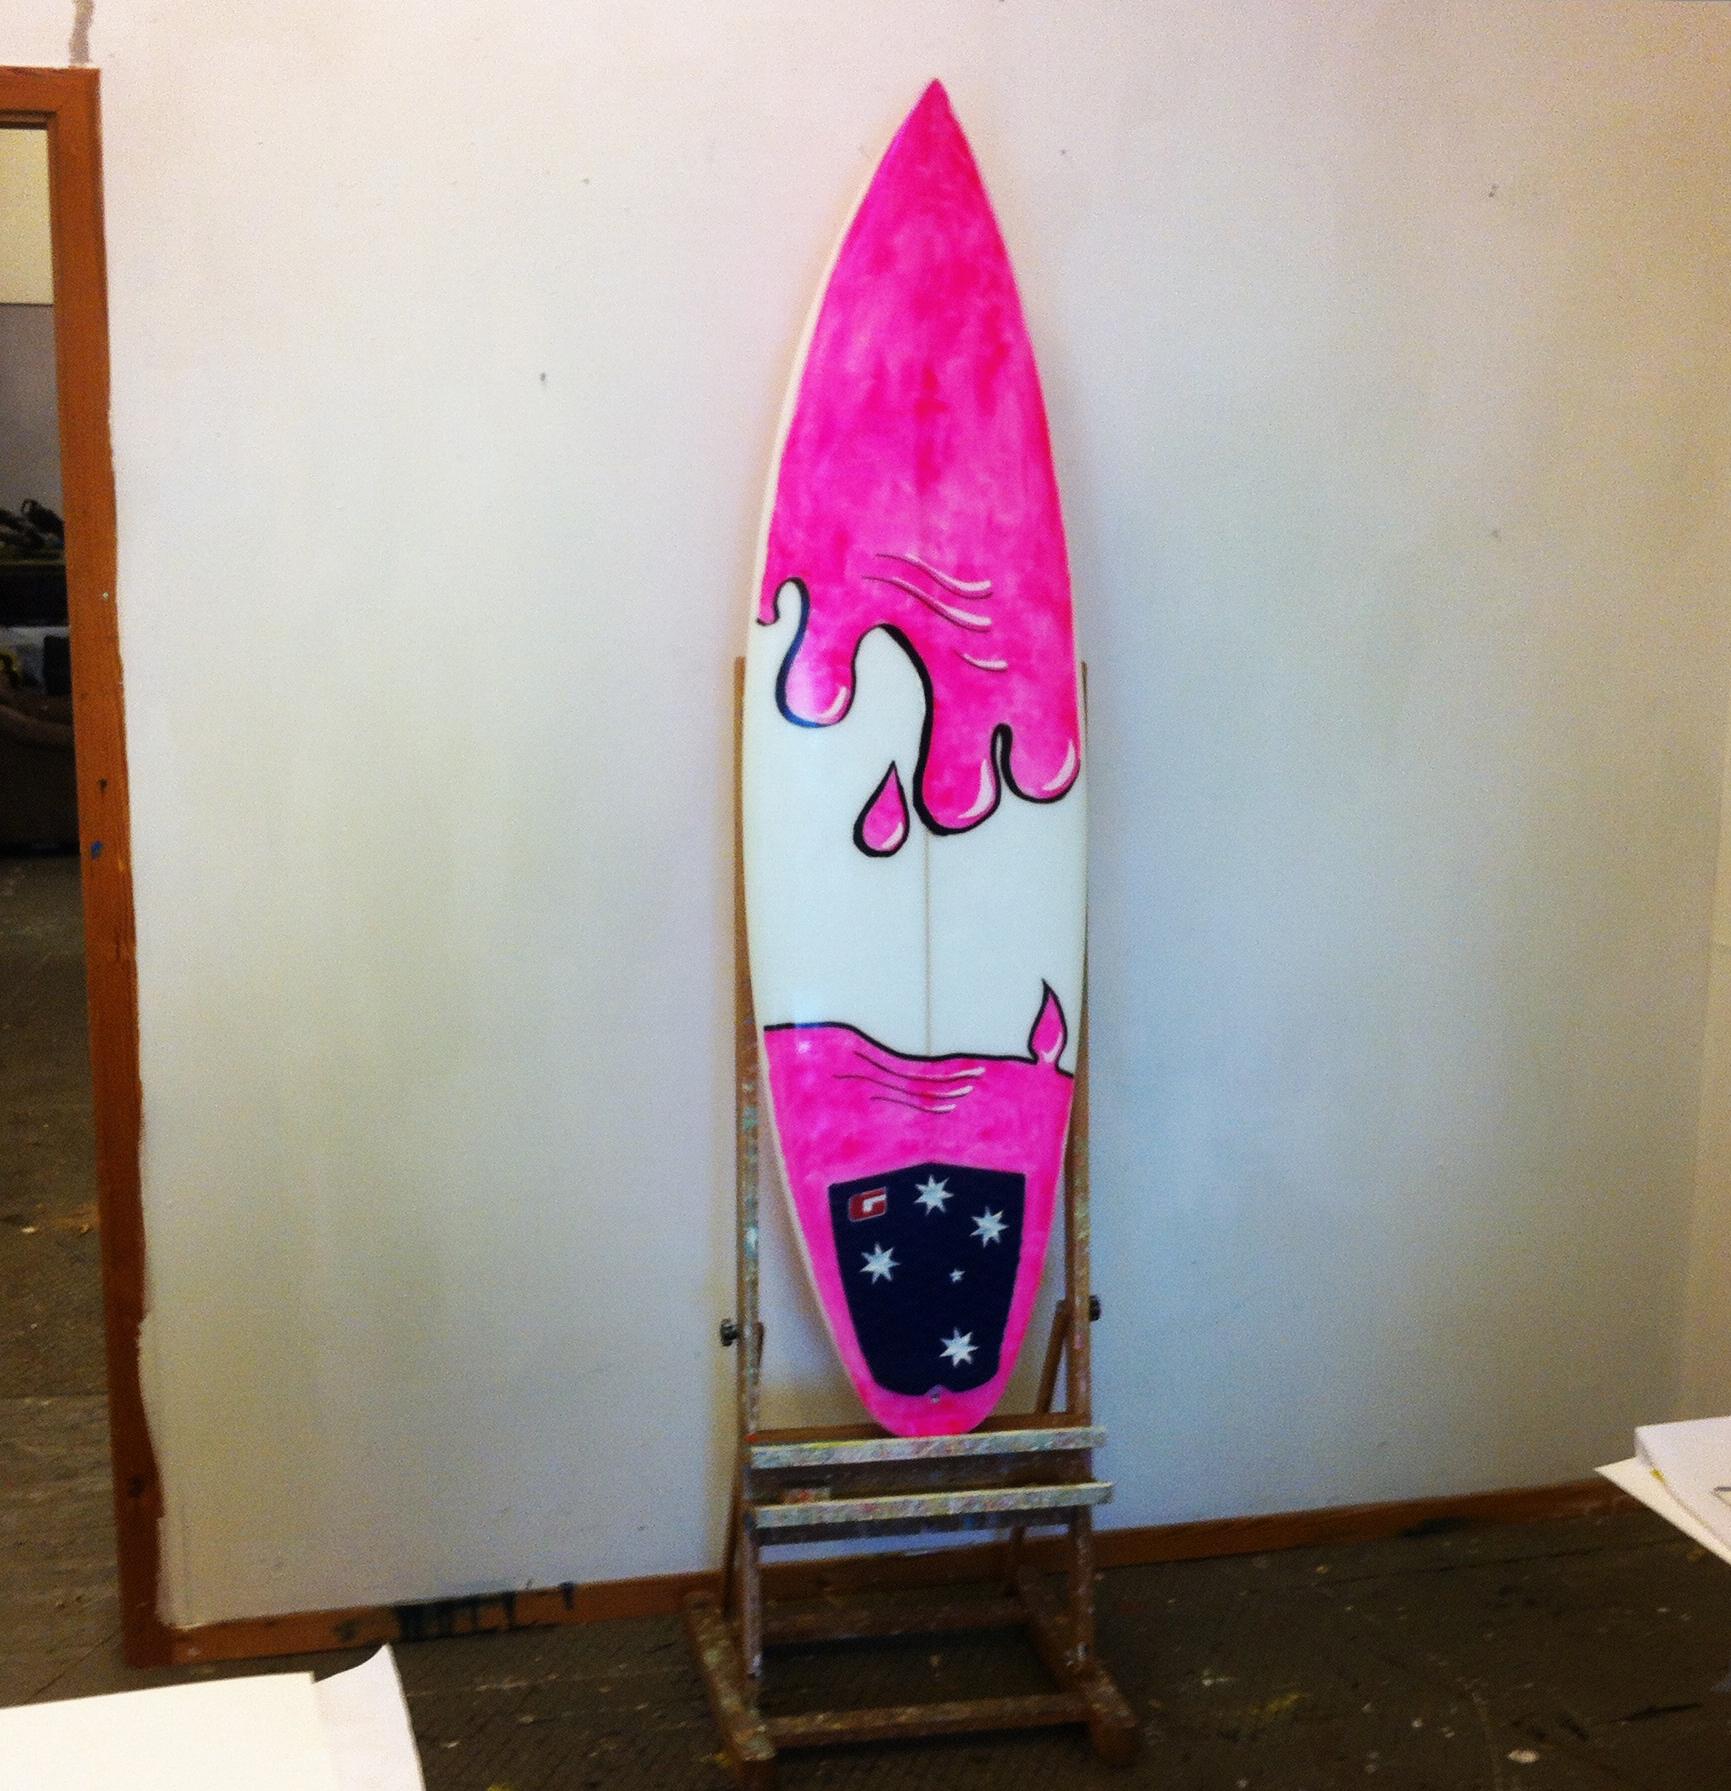 Simple bathroom designs ideas - Simple Surfboard Art Designs Galleryhip Com The